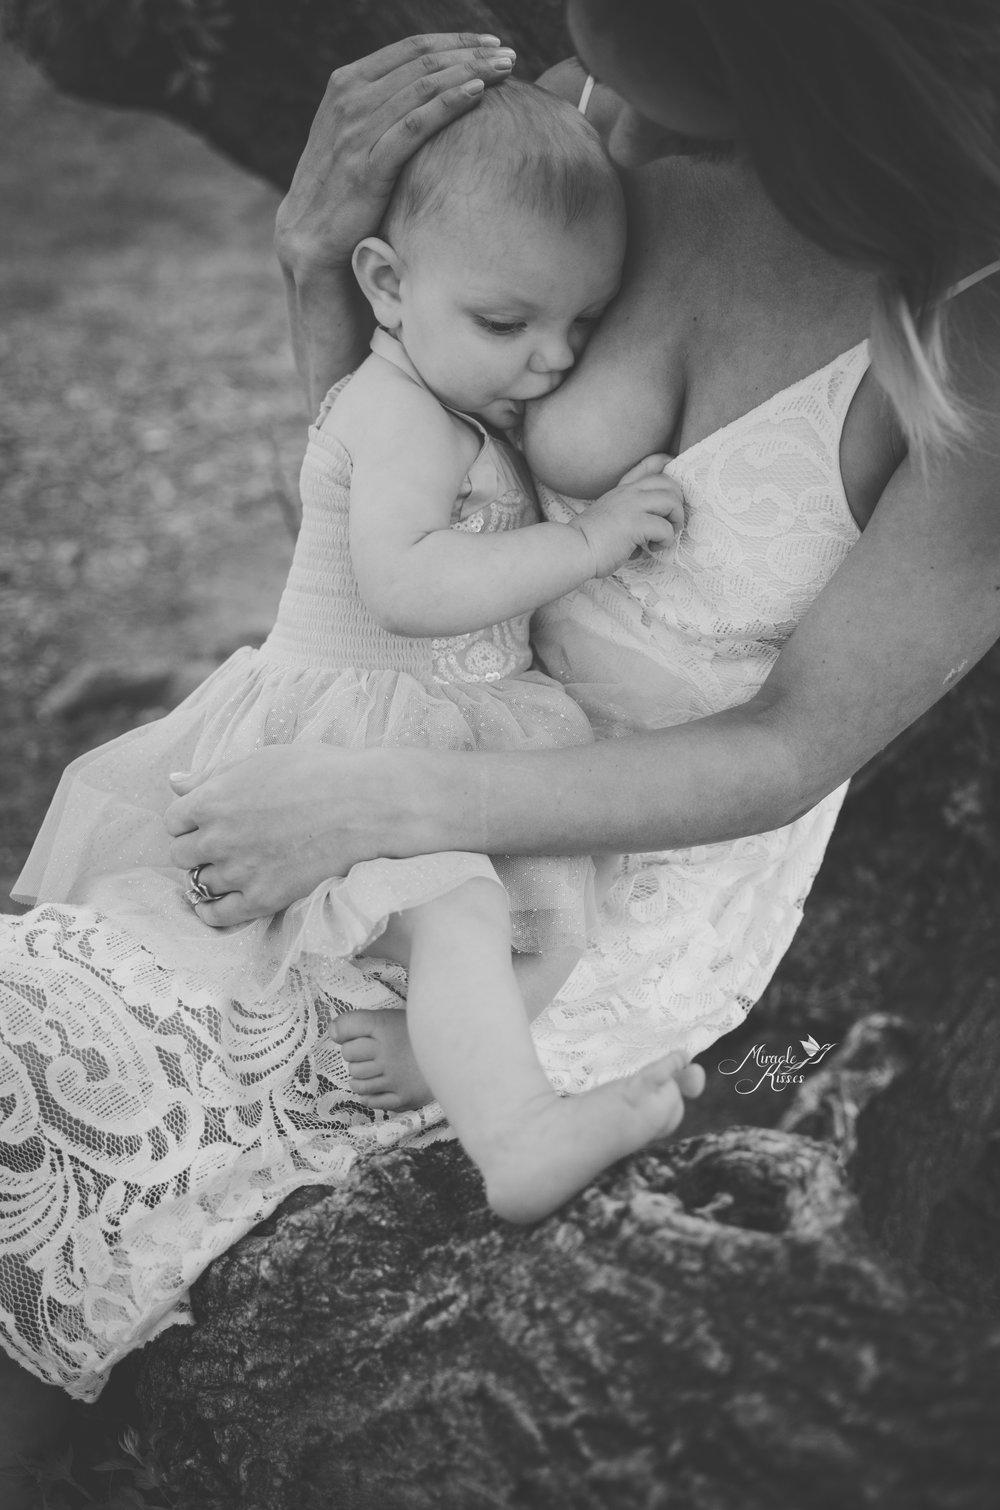 breastfeeding love, liquid gold, 31 days 31 stories